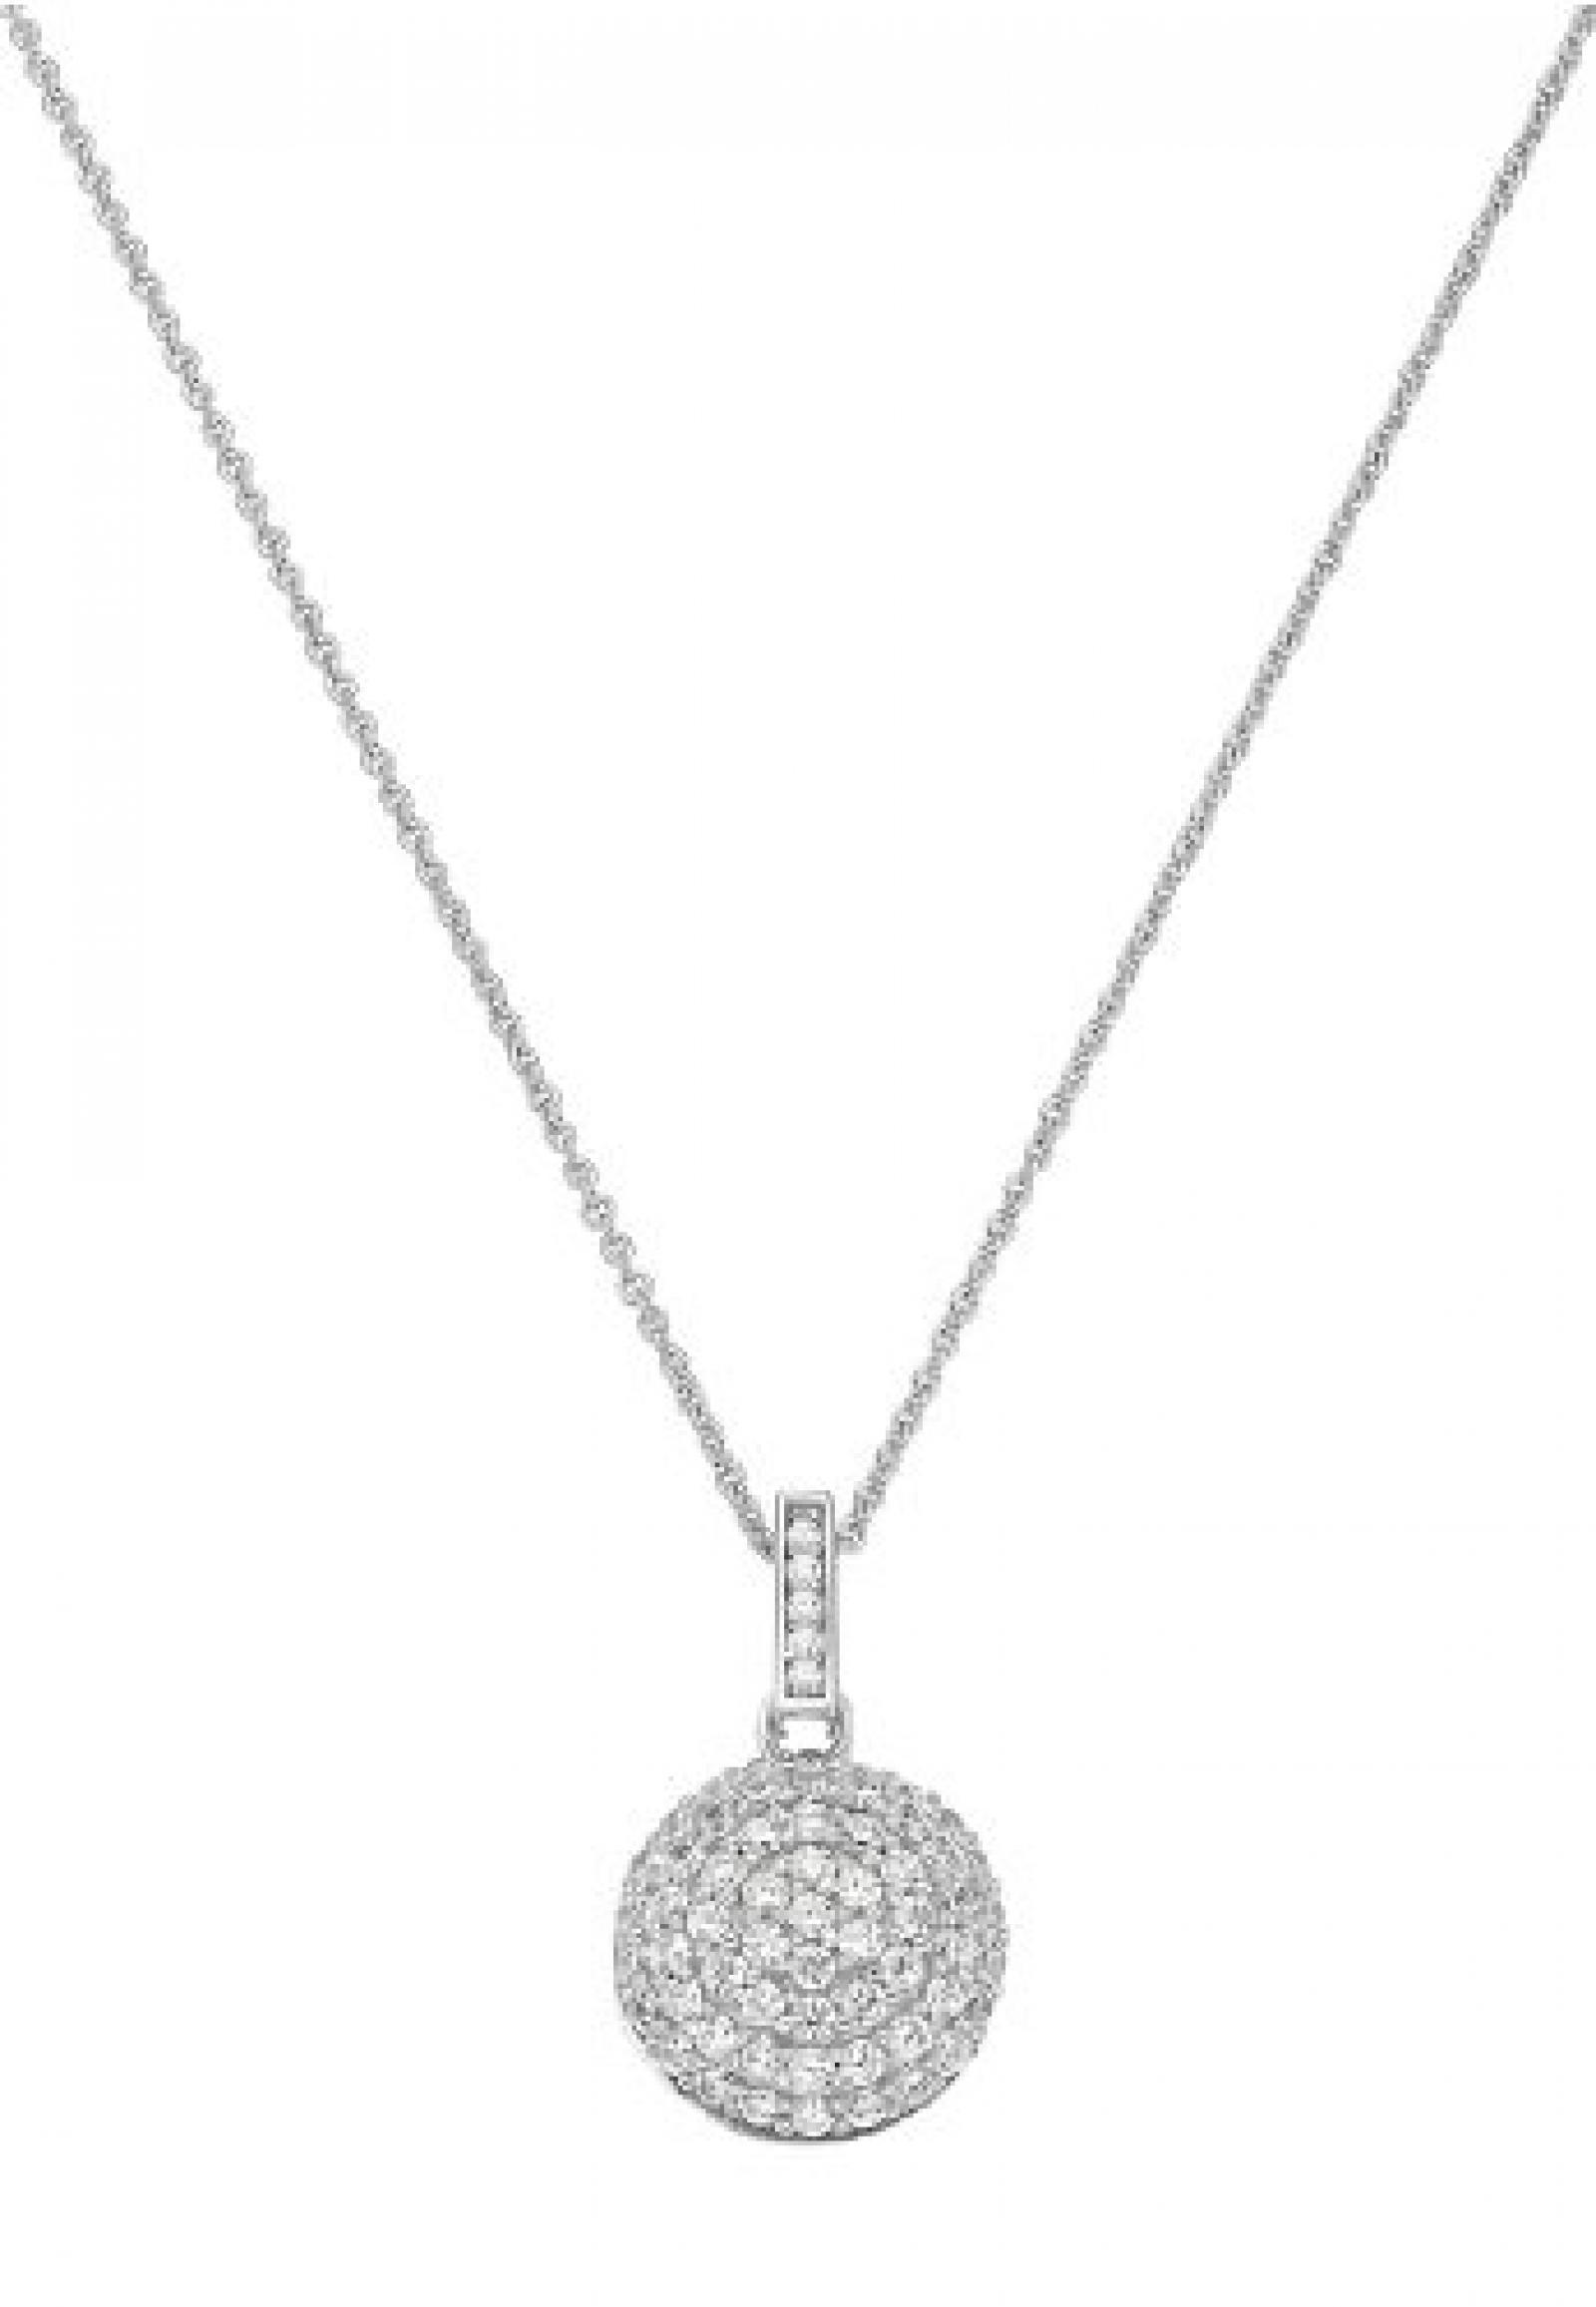 JETTE Silver Damen-Collier Precious Bowl 925er Silber rhodiniert 59 Zirkonia silber, One Size